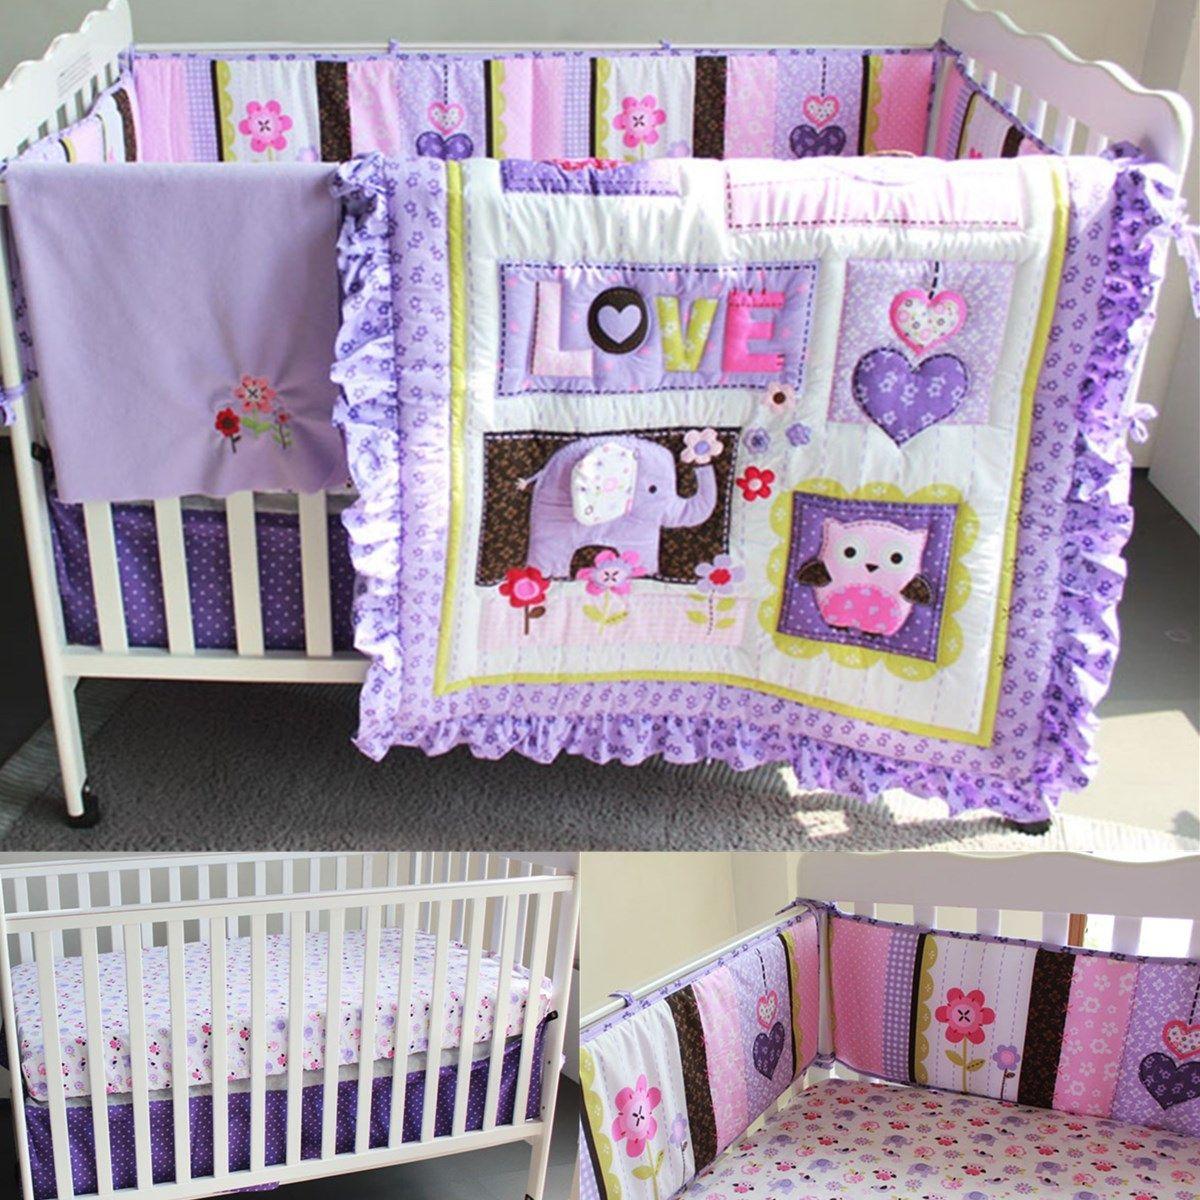 8 Pcs/set Baby Bedding Set Purple Elephant Crib Cot Quilt Bumper Sheet Dust Ruffle Cotton Polyester Bumper Pads Sheets